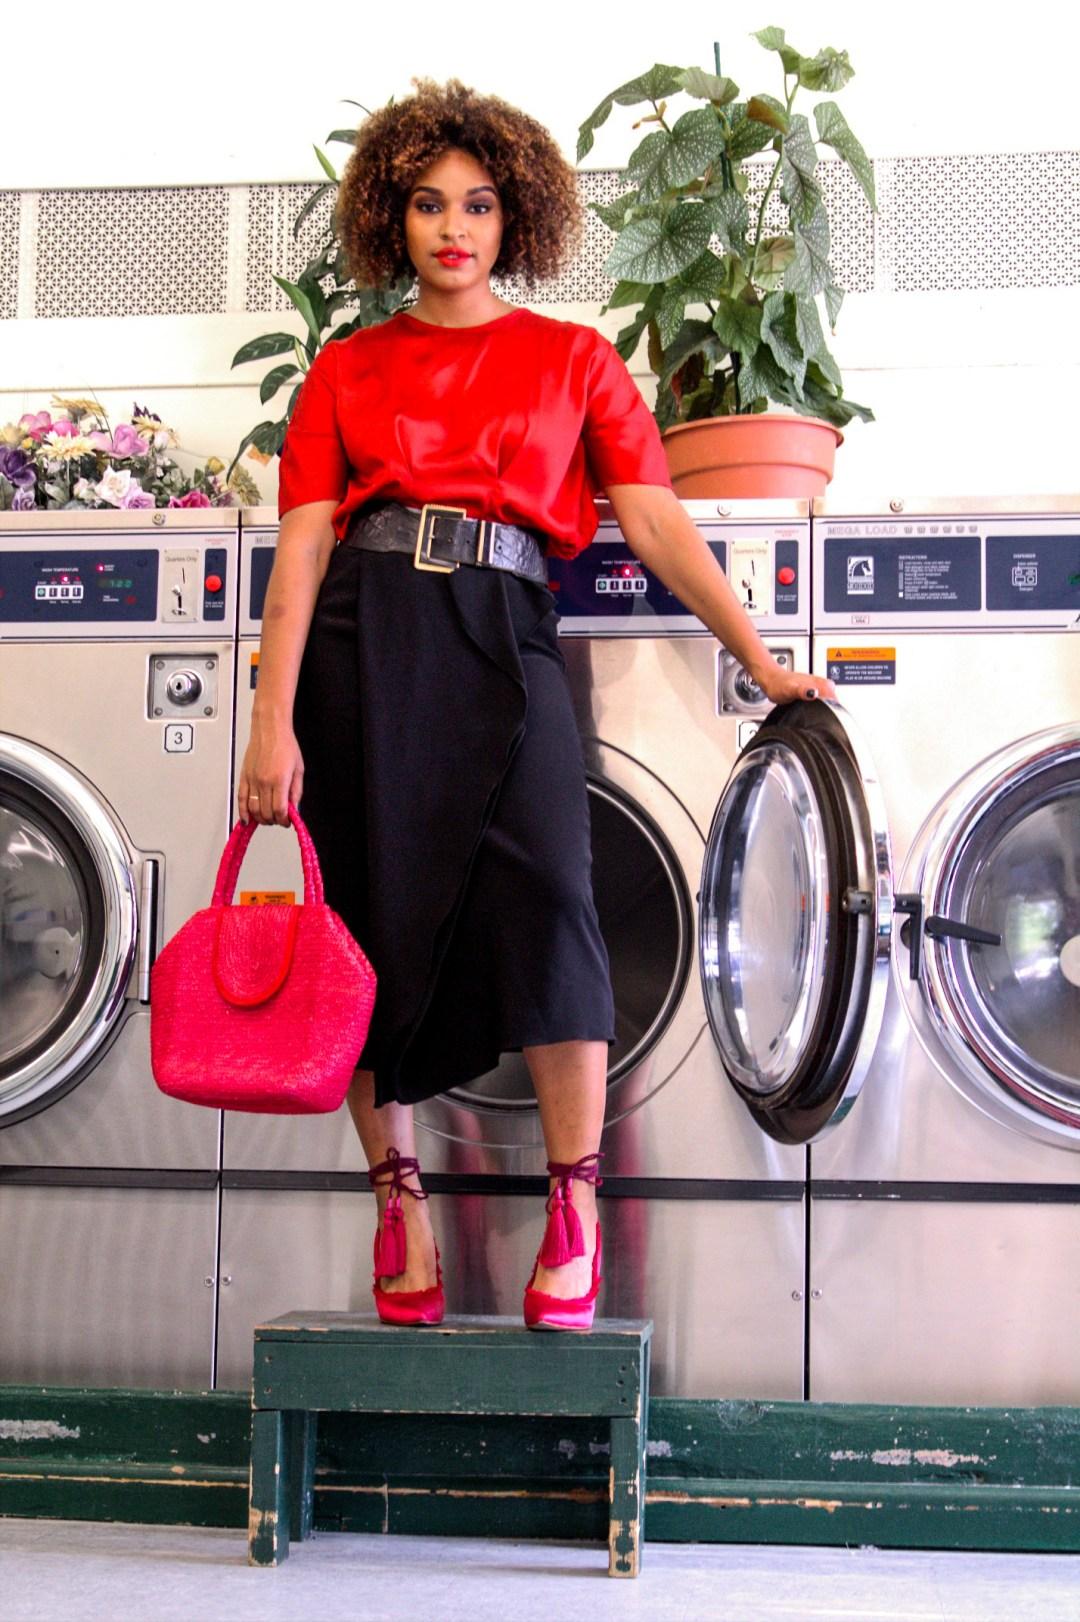 Laundromat Blogger Photoshoot